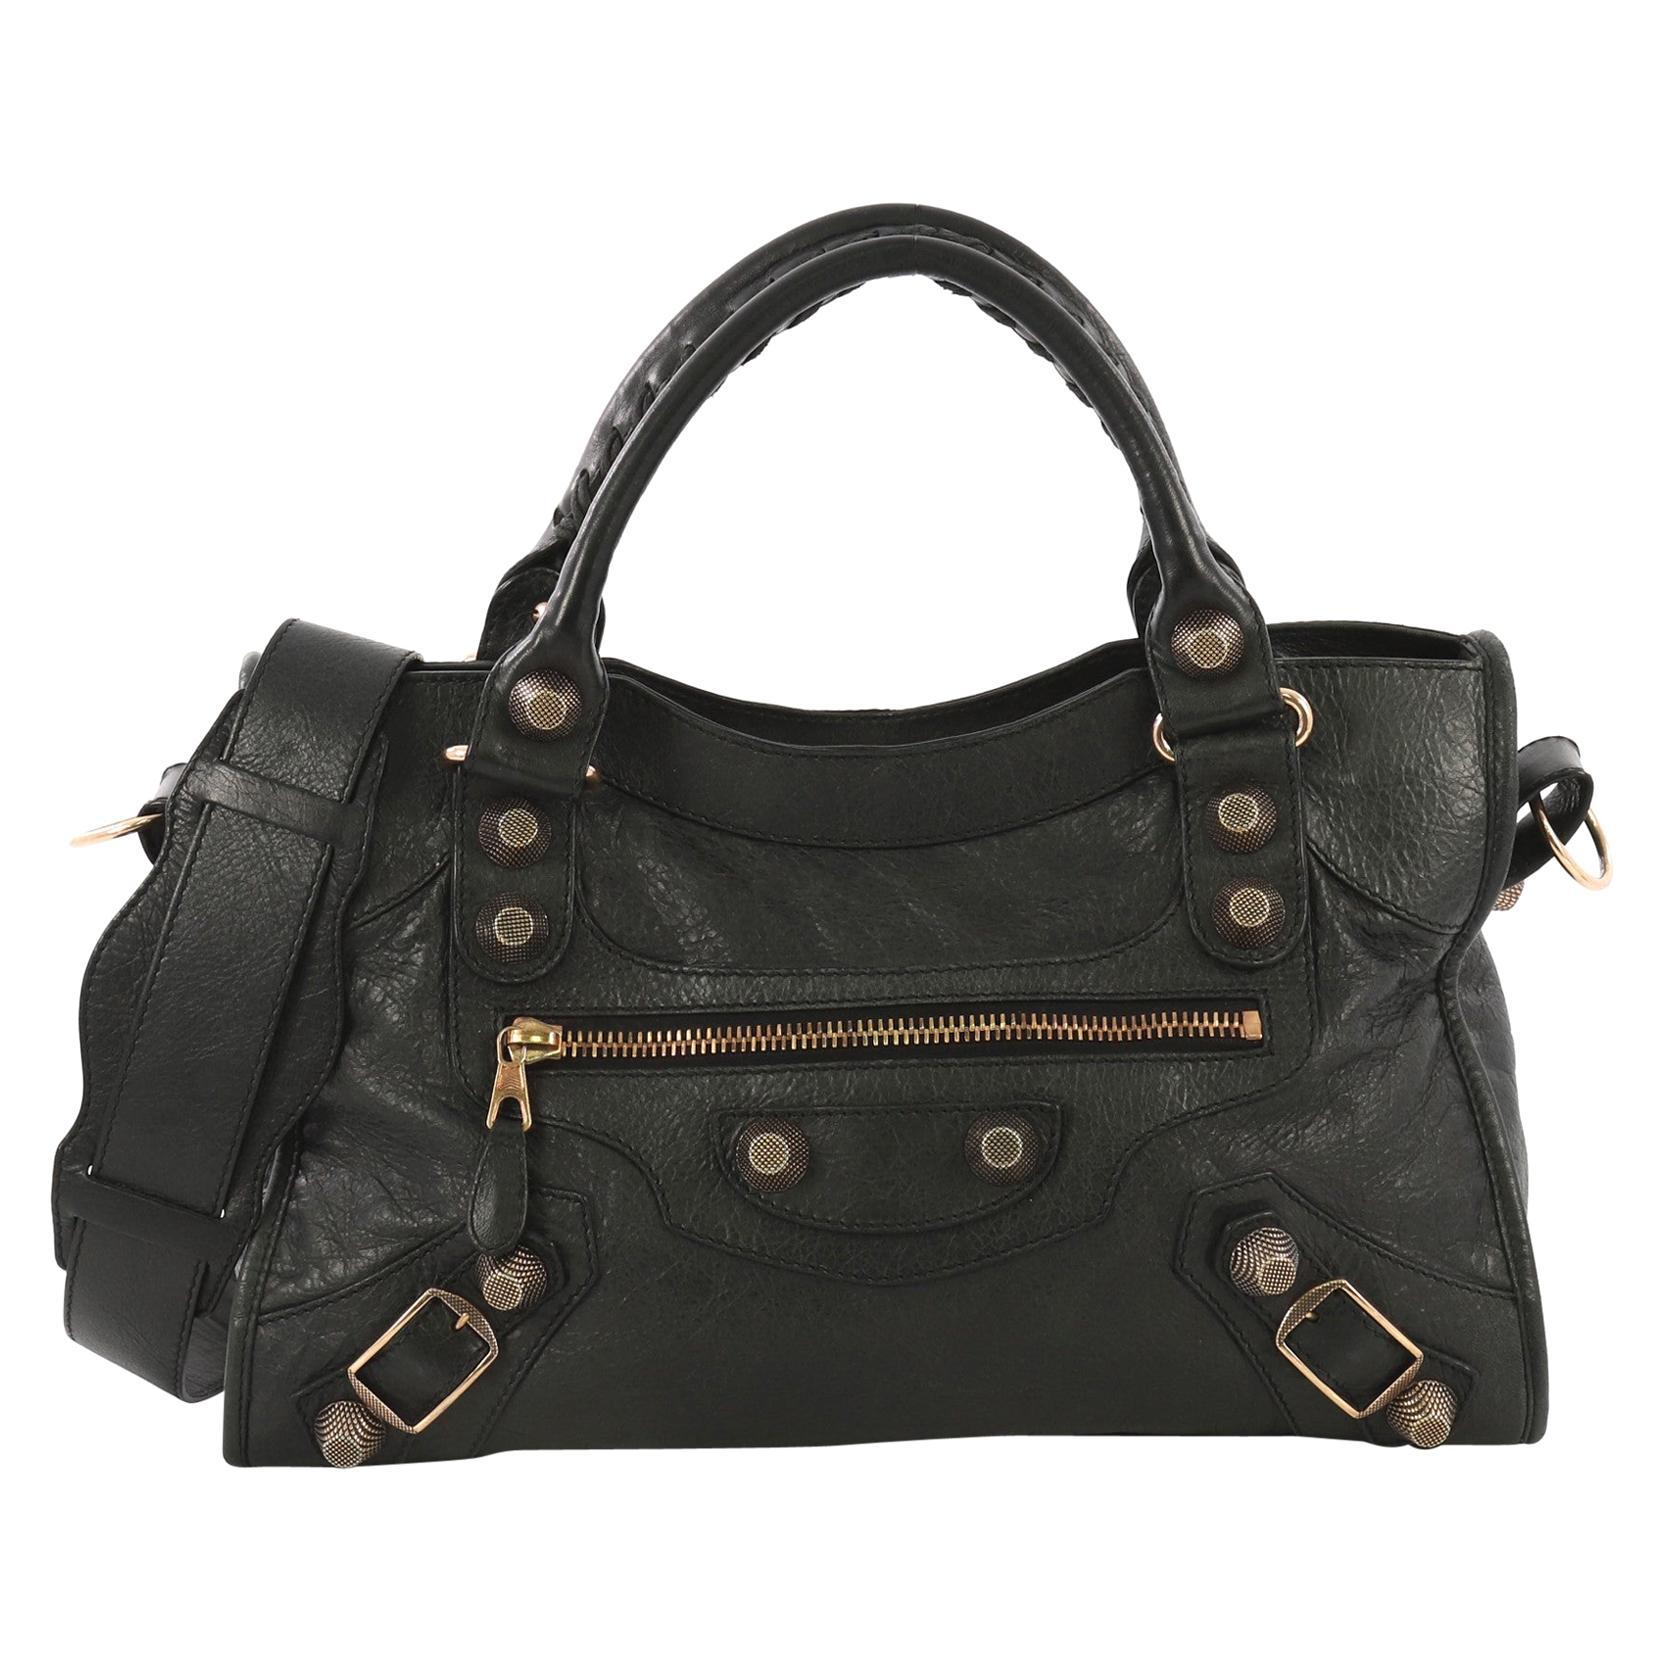 d92344c5b1 Vintage Balenciaga Handbags and Purses - 298 For Sale at 1stdibs